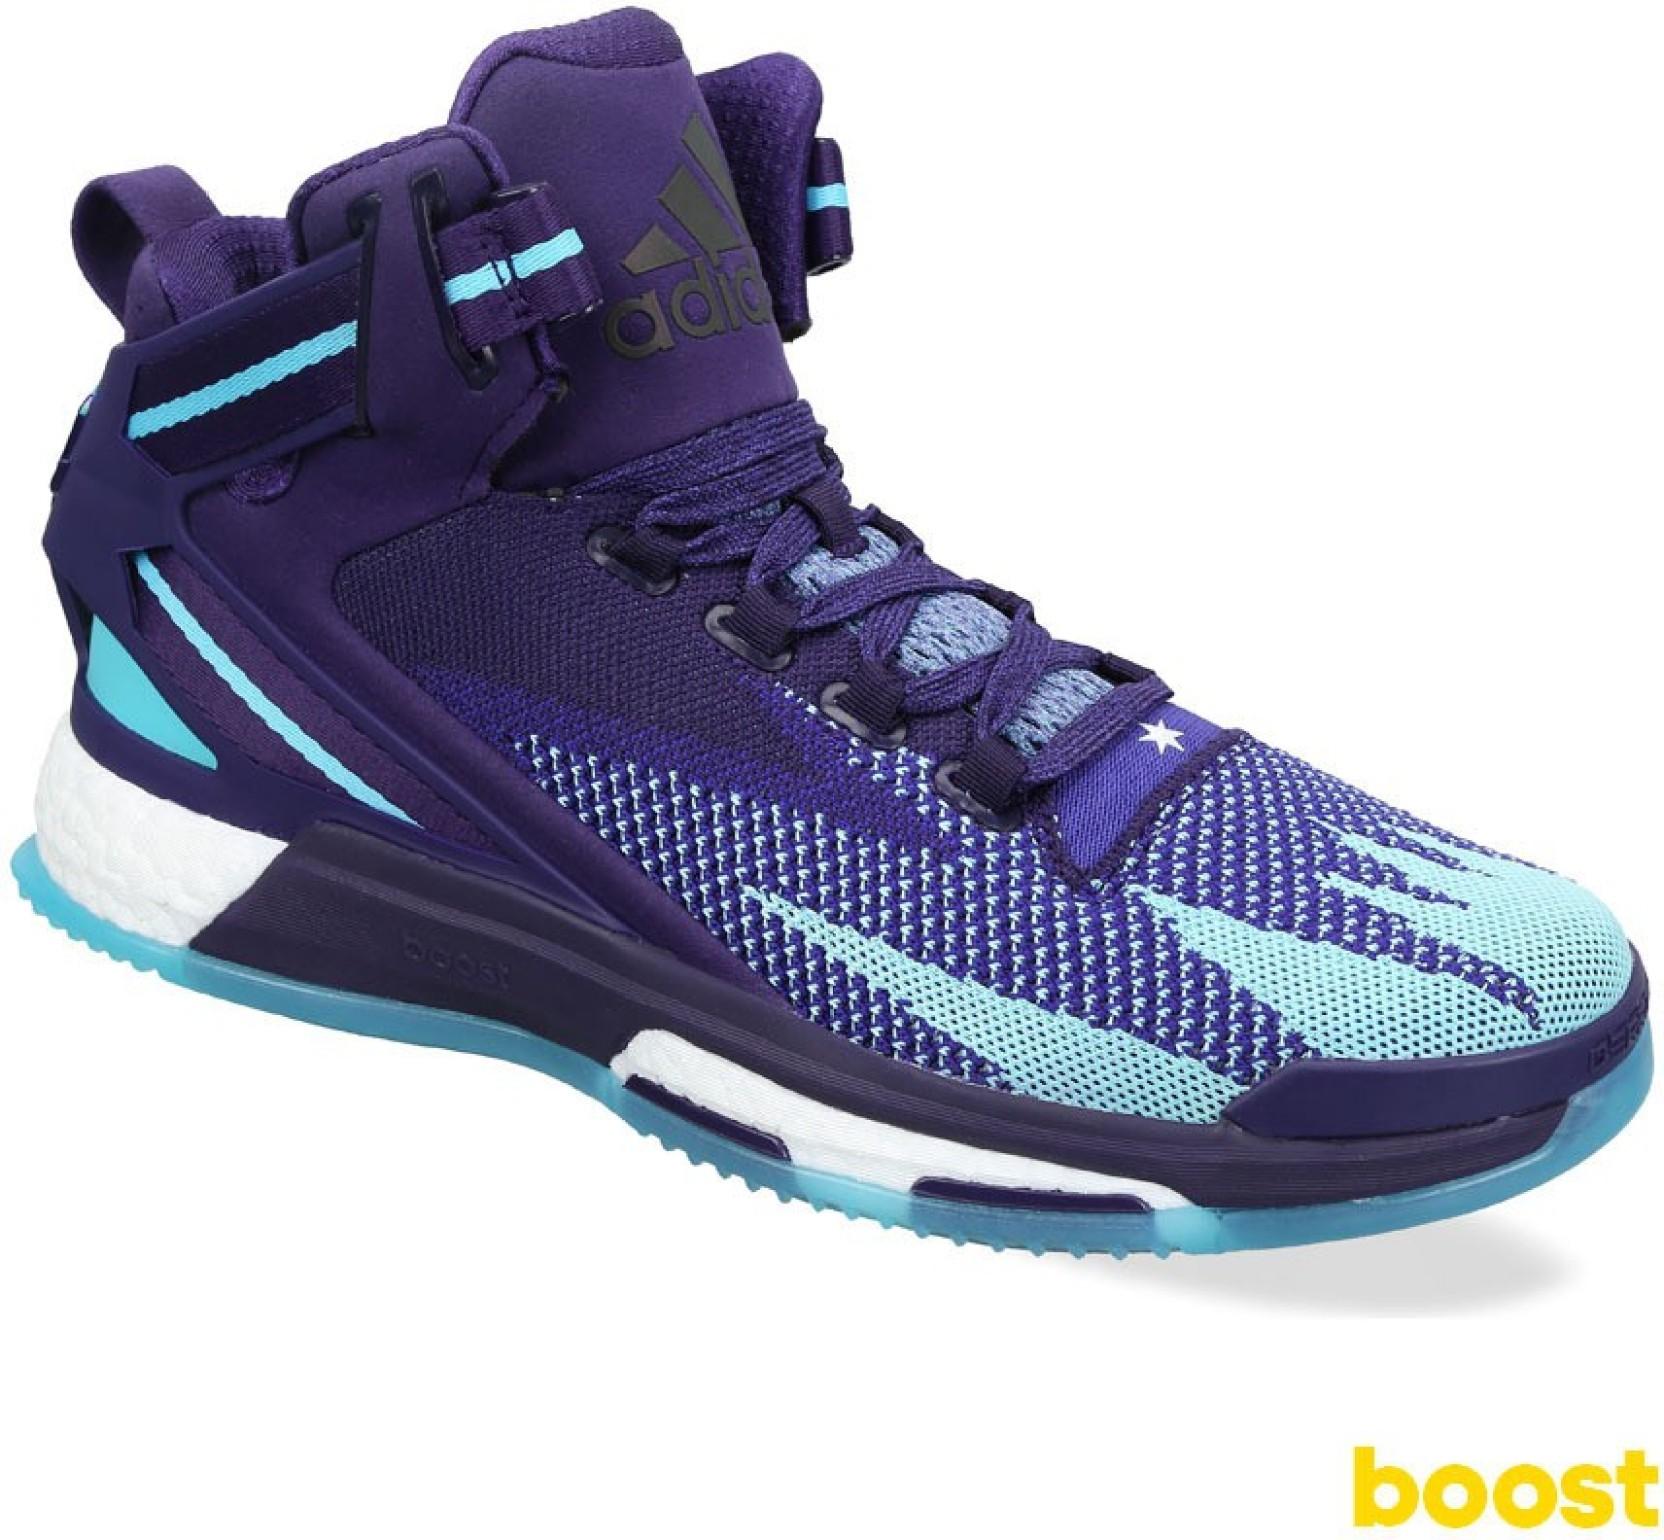 ADIDAS D ROSE 6 BOOST PRIMEKNIT Men Basketball Shoes For Men - Buy ... b647fb19bcff